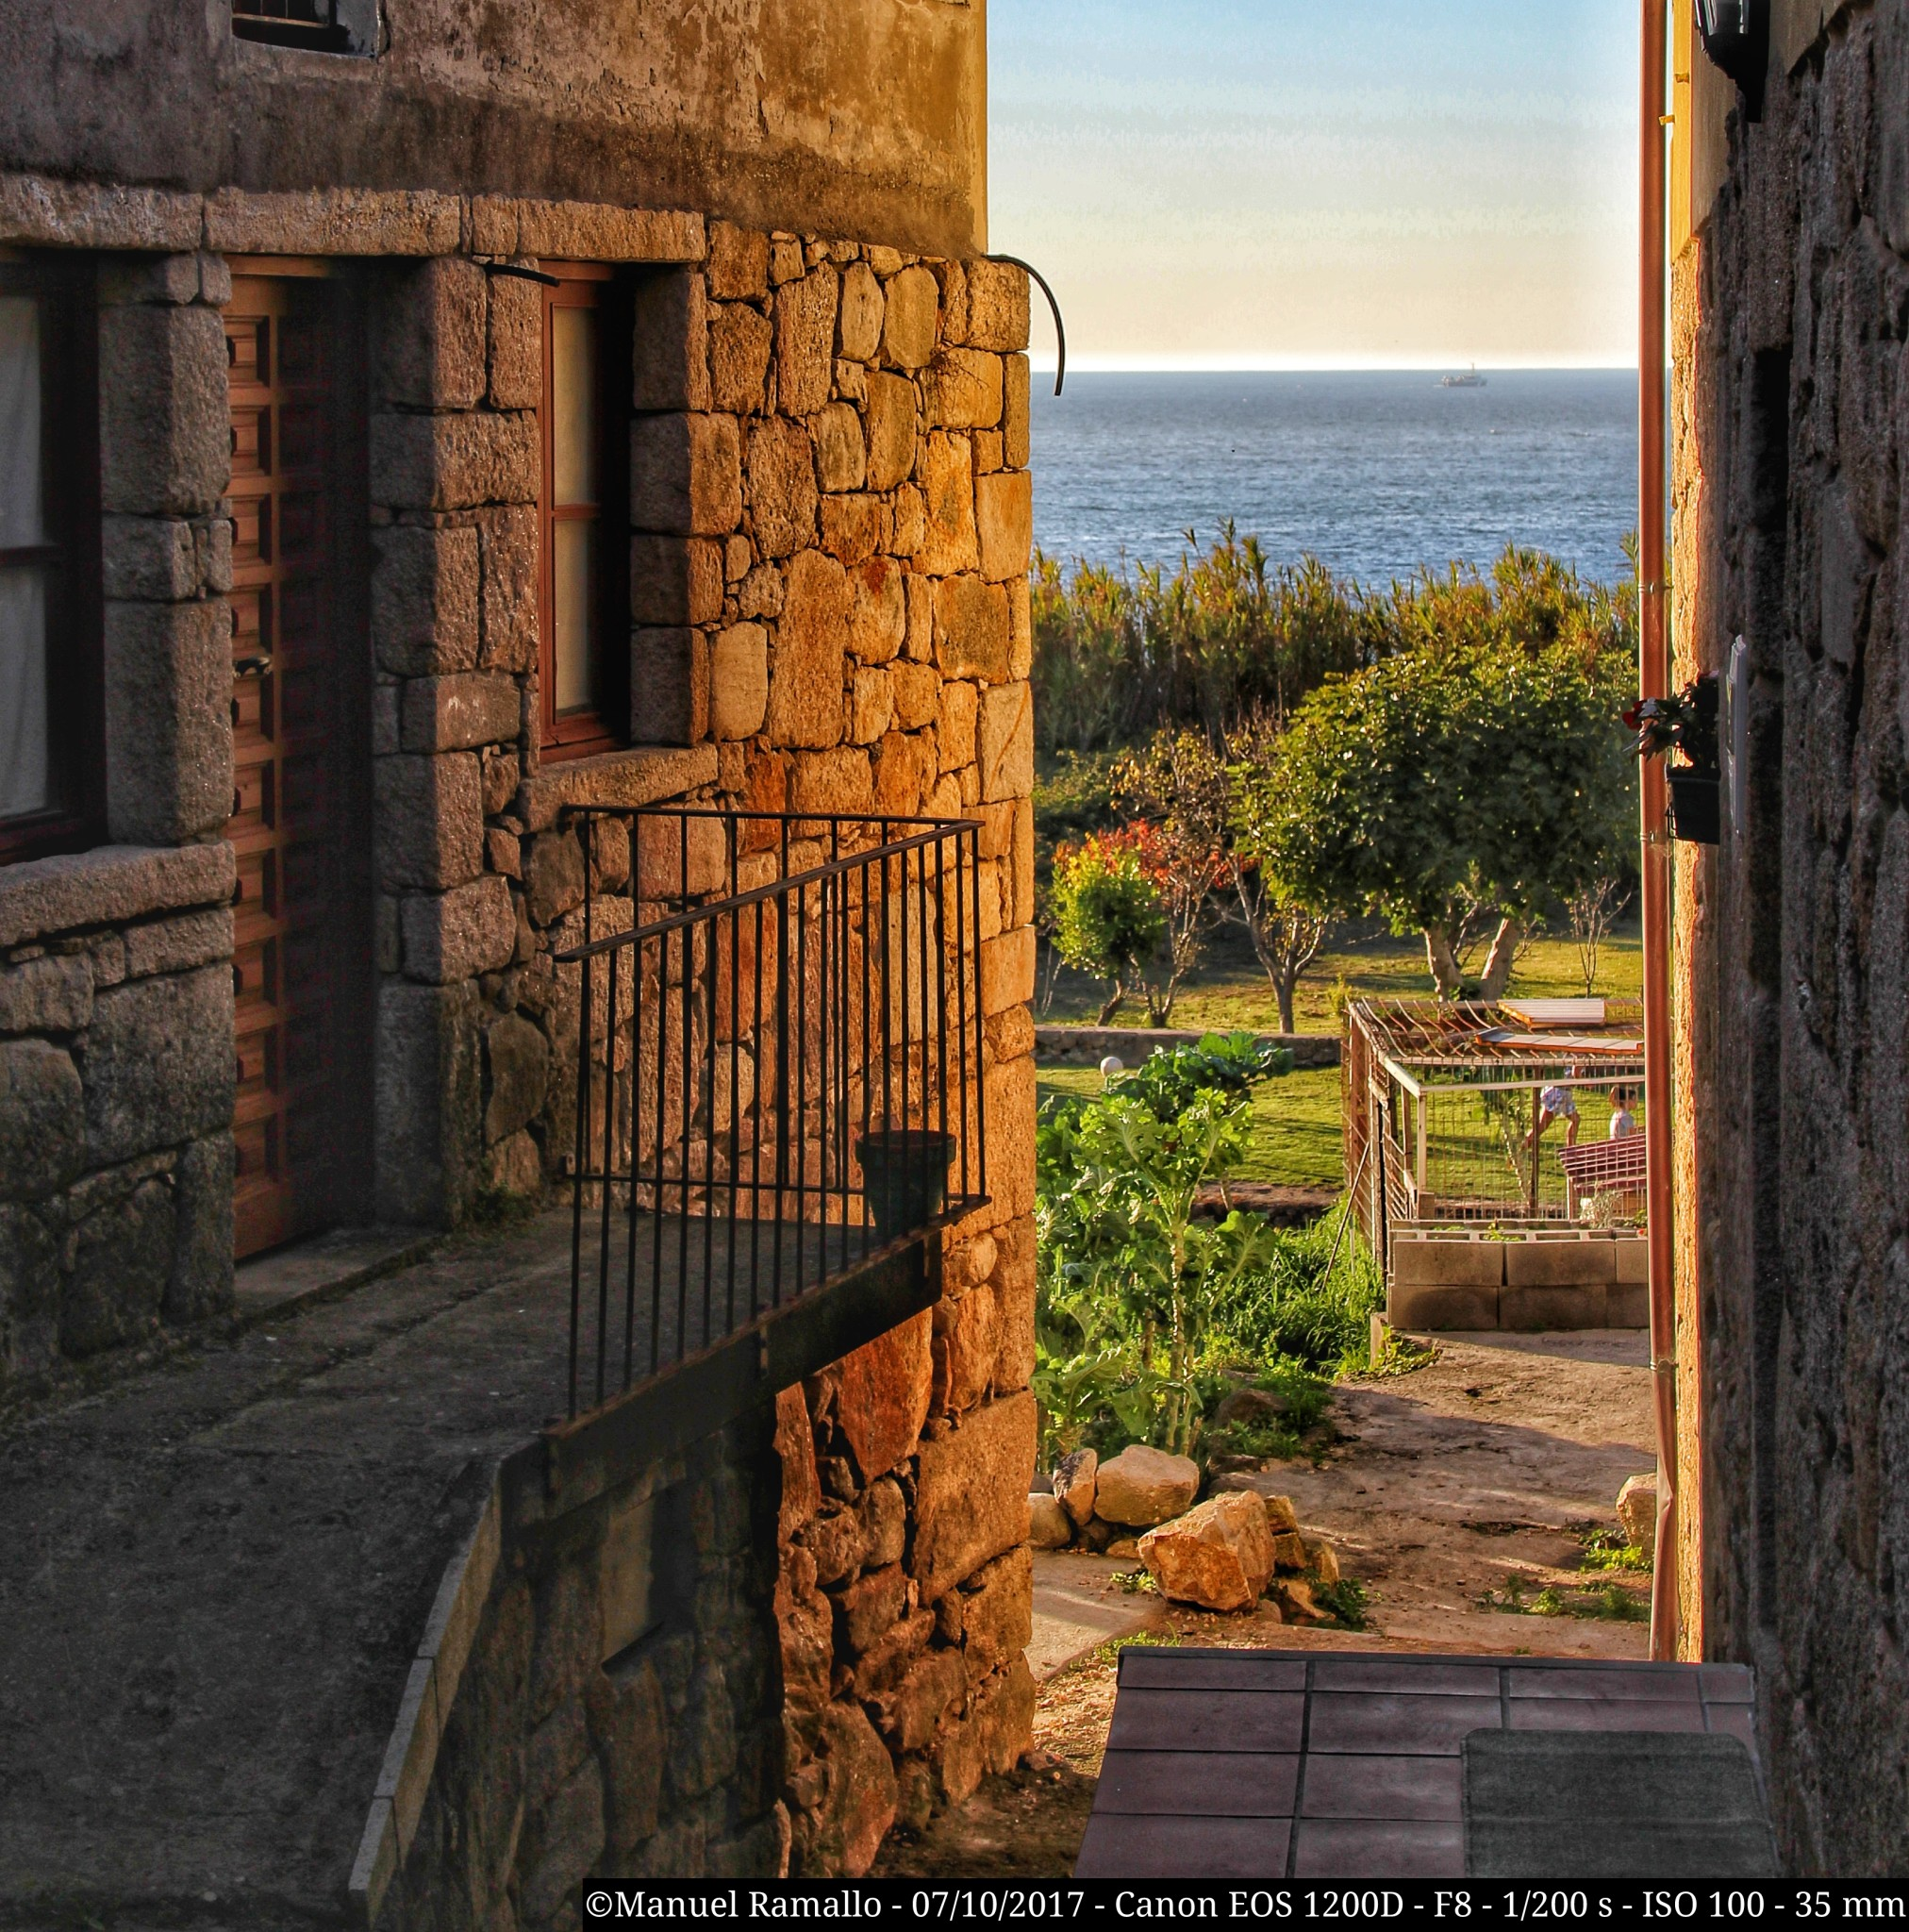 vista-al-mar-desde-casco-antiguo-de-oia-oya-pontevedra